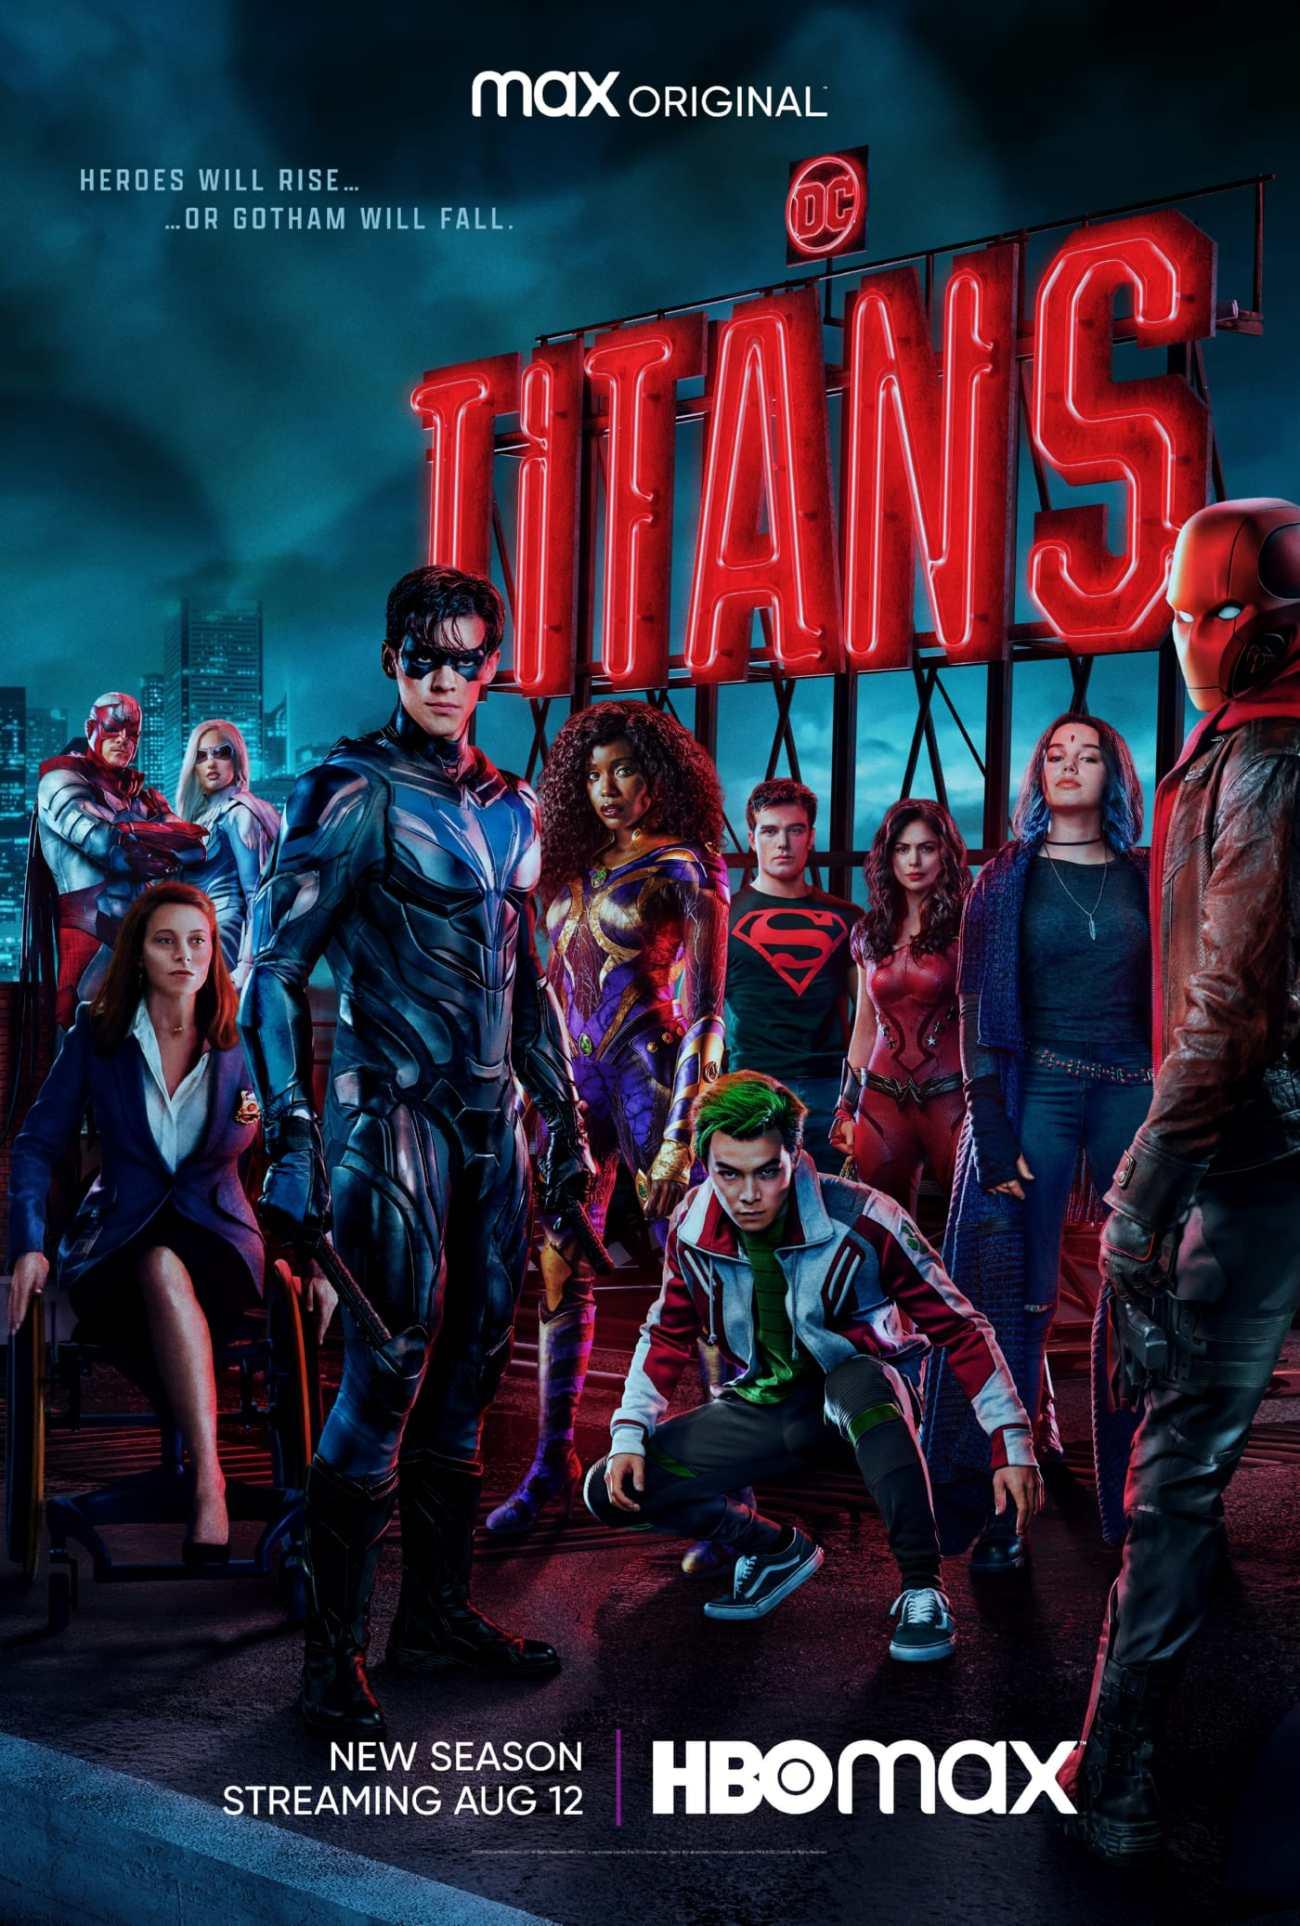 Póster promocional de la temporada 3 de Titans. Imagen: SpoilerTV